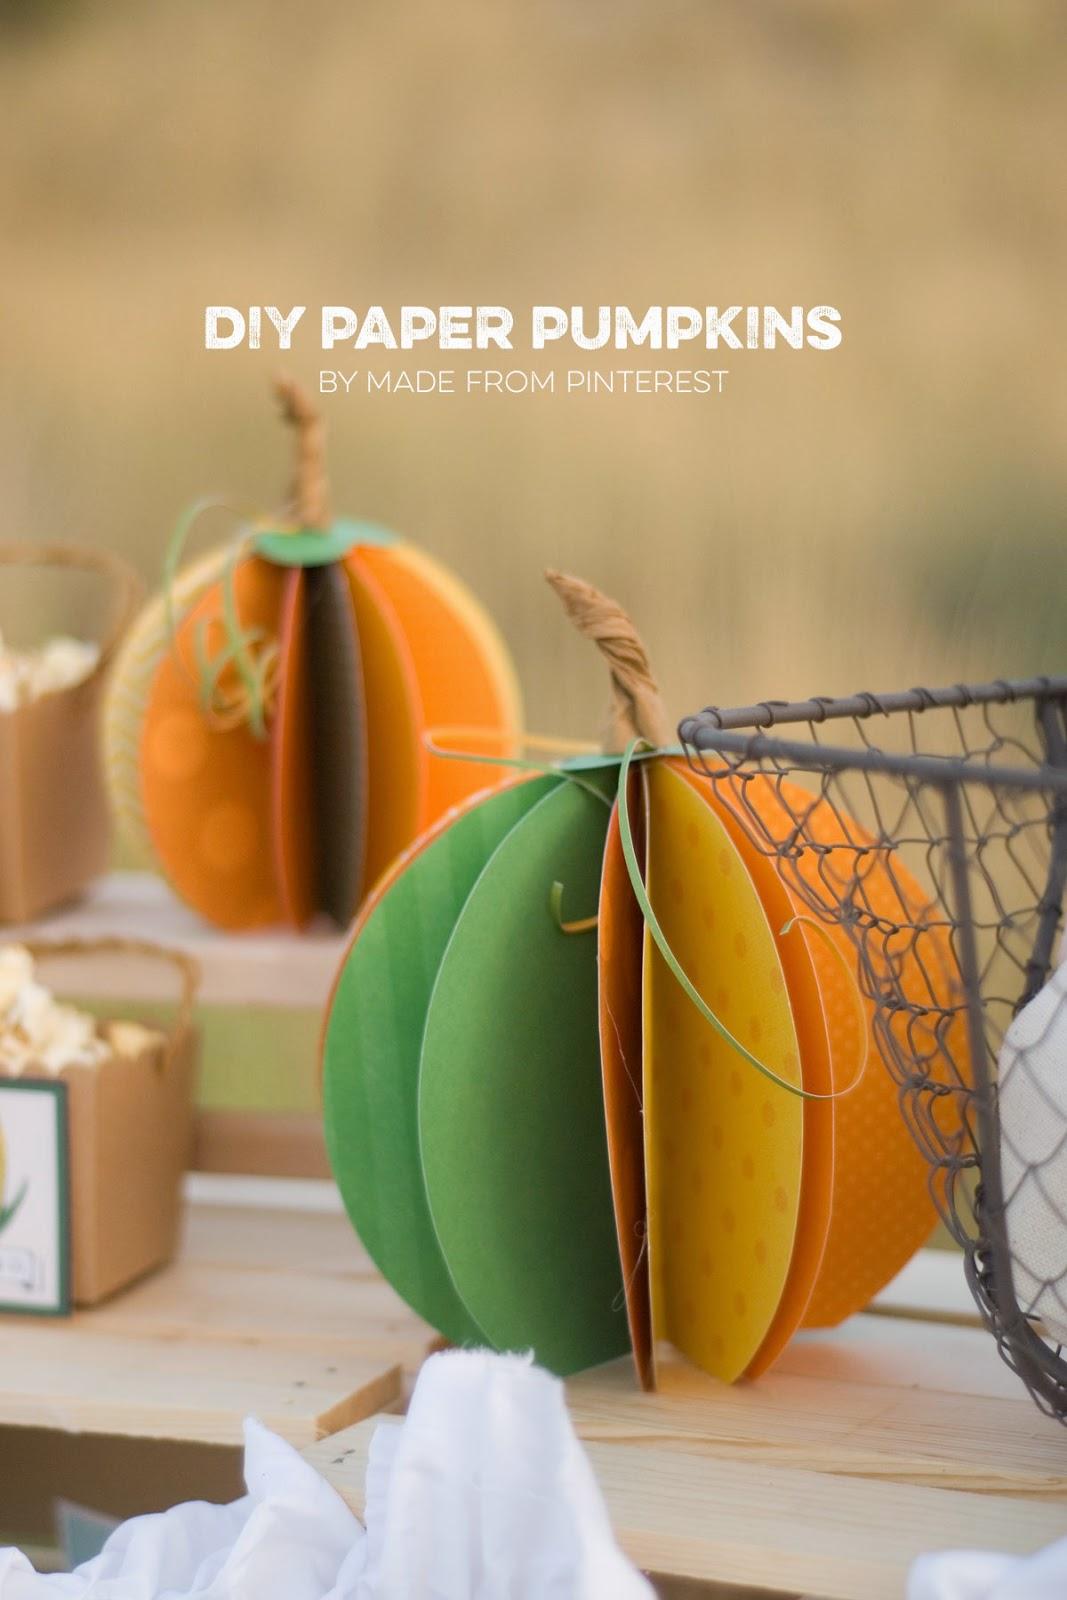 http://3.bp.blogspot.com/-G_EQmuJD9GA/U_lDwrOECqI/AAAAAAAAiCM/EHrPl0uhLJs/s1600/paper-pumpkins.jpg